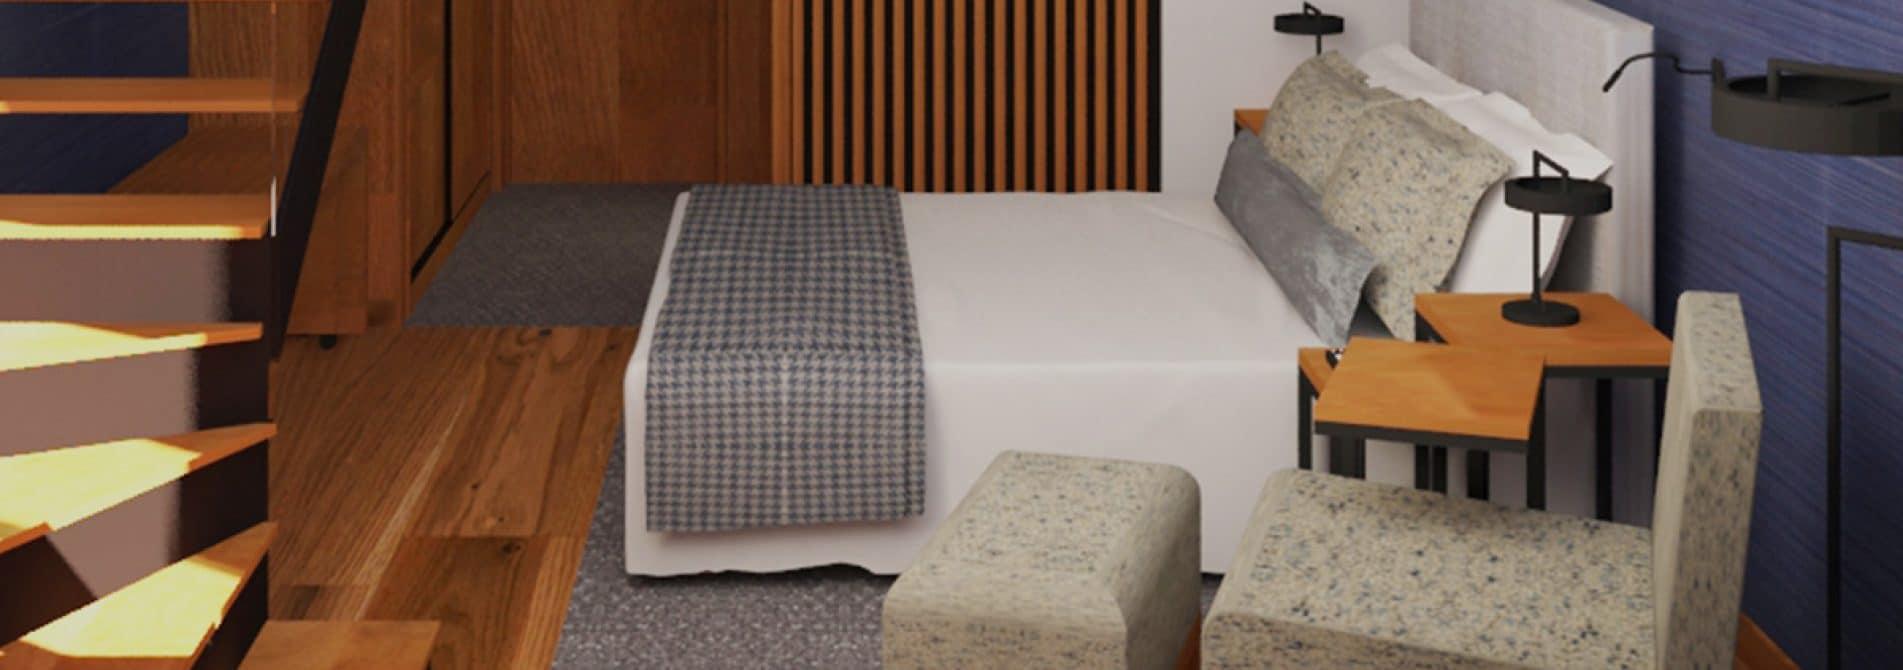 Cama em Suite Duplex NEYA Porto Hotel